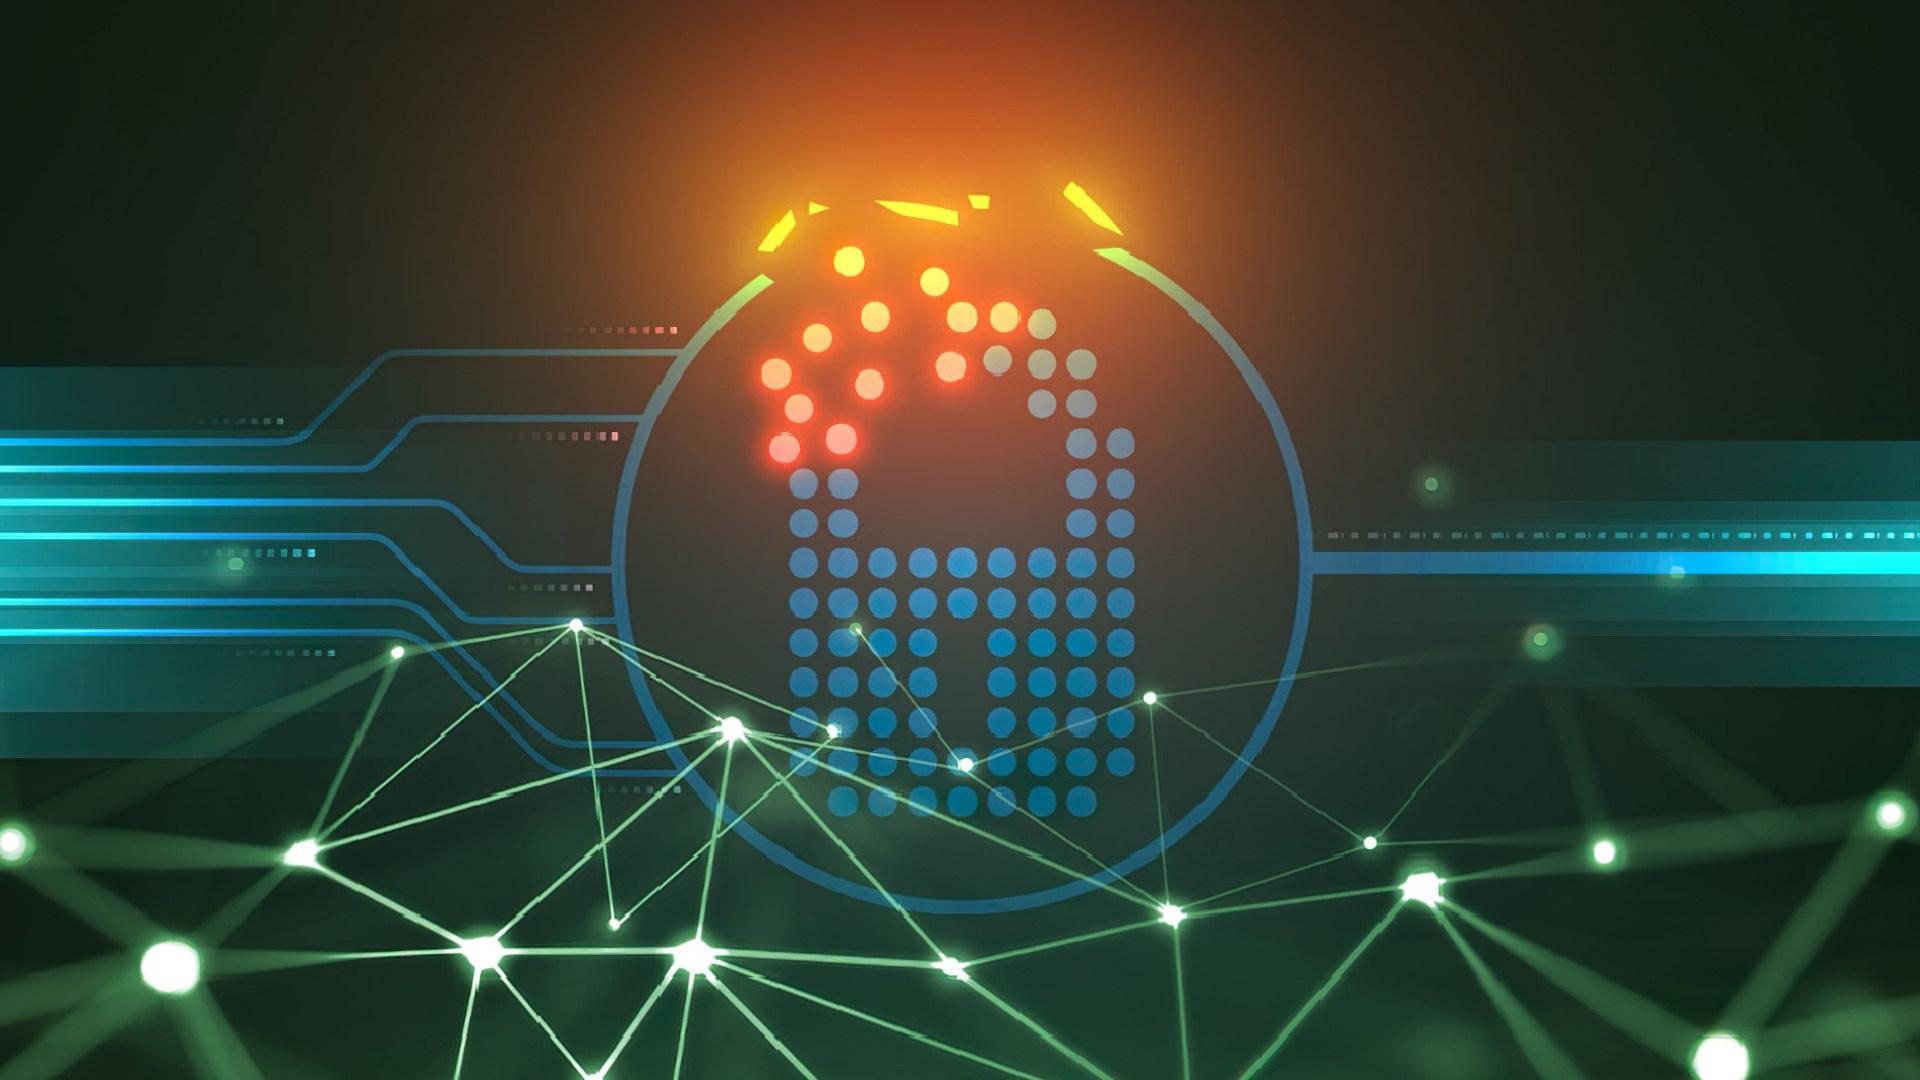 Sicherheit, Sicherheitslücke, Hacker, Security, Hack, Angriff, Linux, Netzwerk, Server, Virus, Kriminalität, Schadsoftware, Exploit, Cybercrime, System, Hacking, Cybersecurity, Hackerangriff, Ausfall, Internetkriminalität, Ddos, Darknet, Hacker Angriffe, Hacker Angriff, Ransom, Attack, Crash, Gehackt, Unix, Error, Serverfarm, Admin, Administrator, Serverrack, Webserver, Rack, Serverausfall, Server Manager